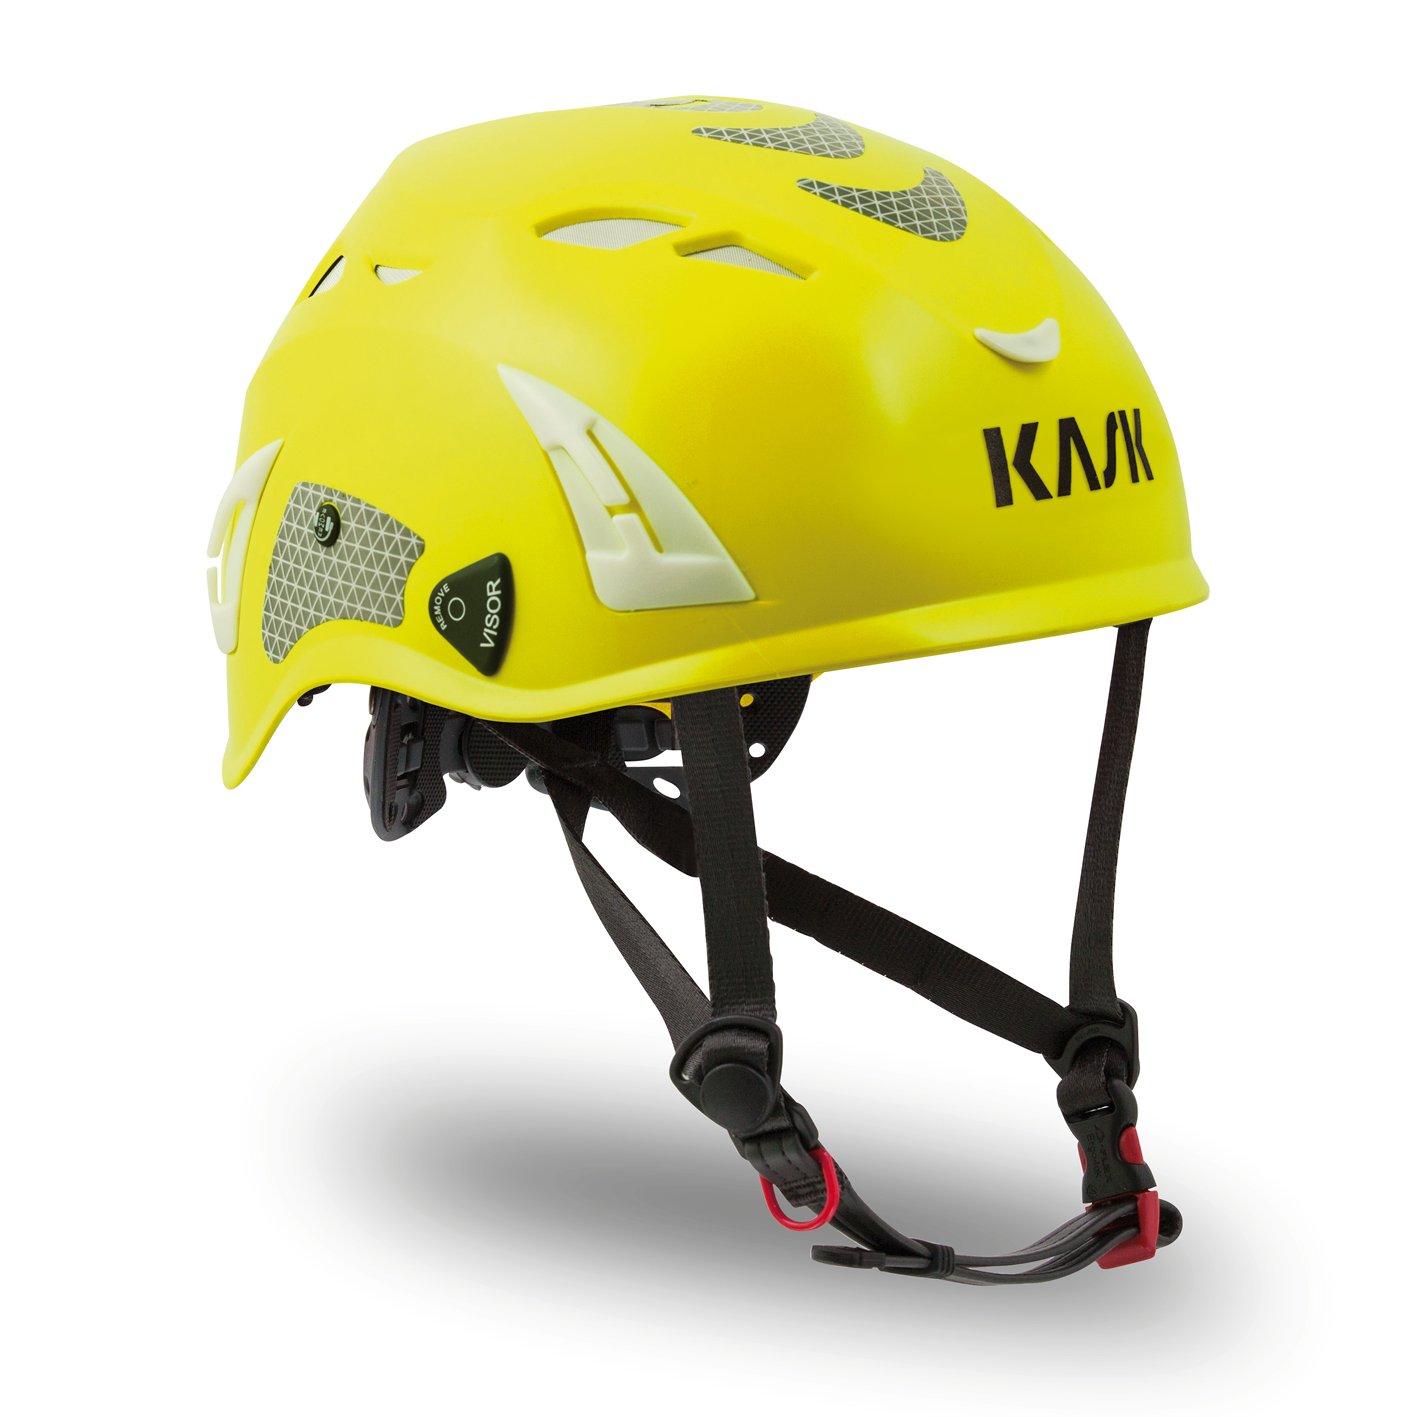 Kask Super Plasma HI VIZ Arborist Safety Helmet Yellow WHE00037.221